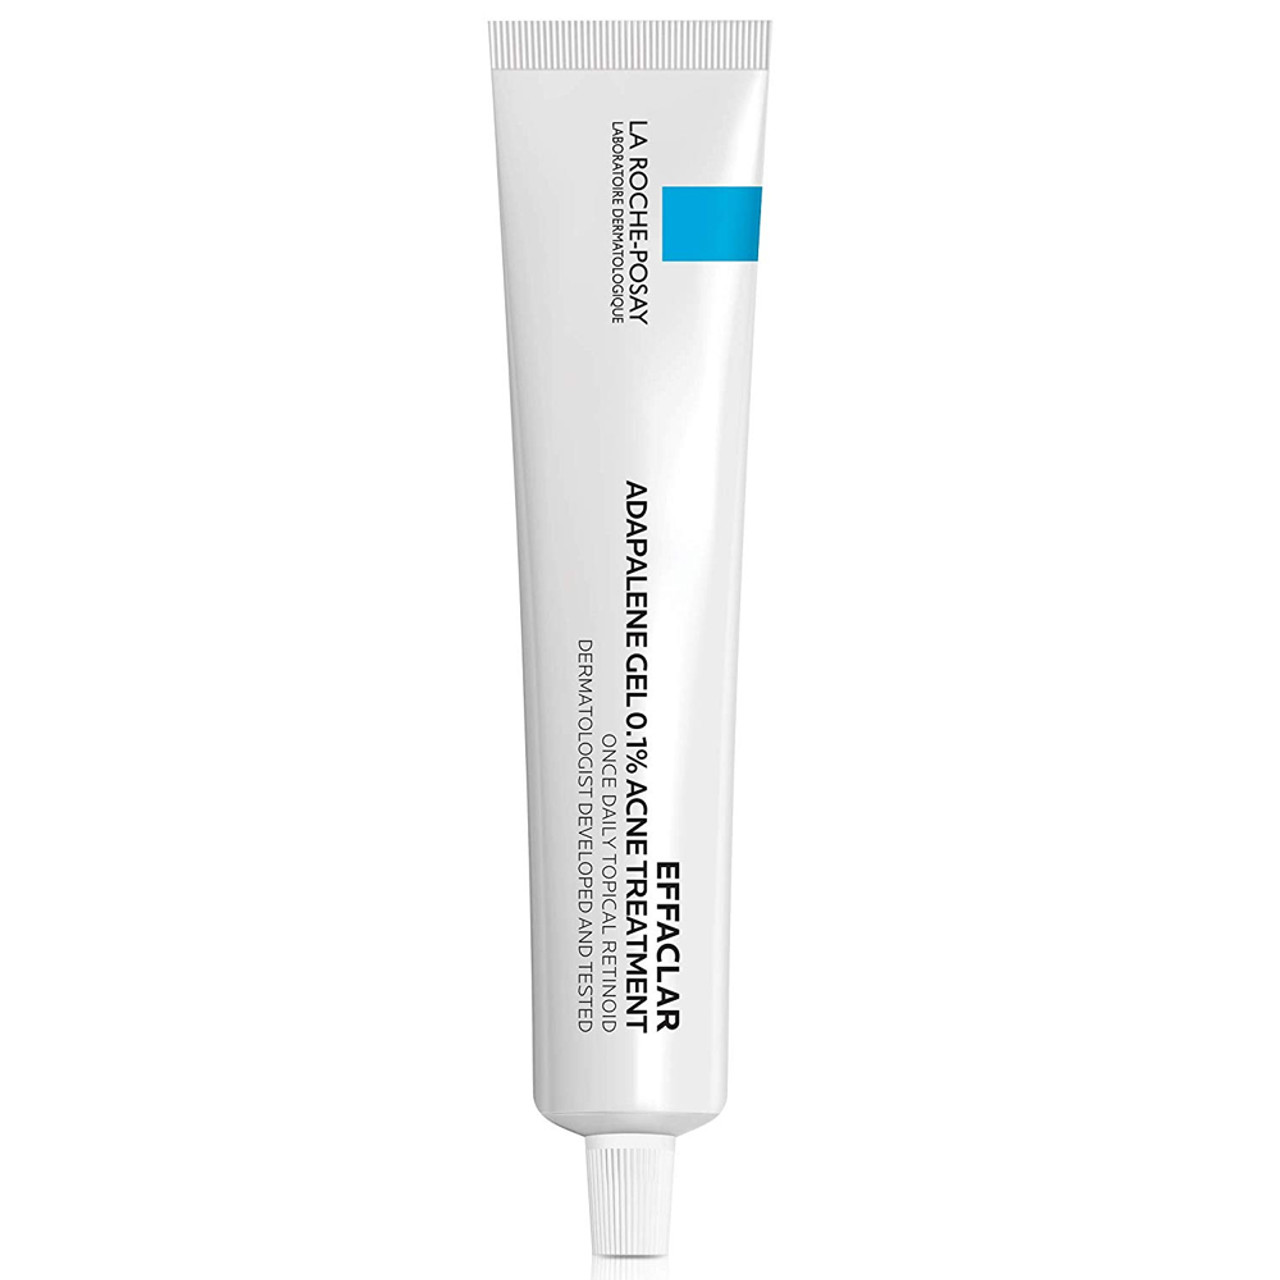 La Roche Posay Effaclar Adapalene Gel 0.1% Acne Treatment BeautifiedYou.com